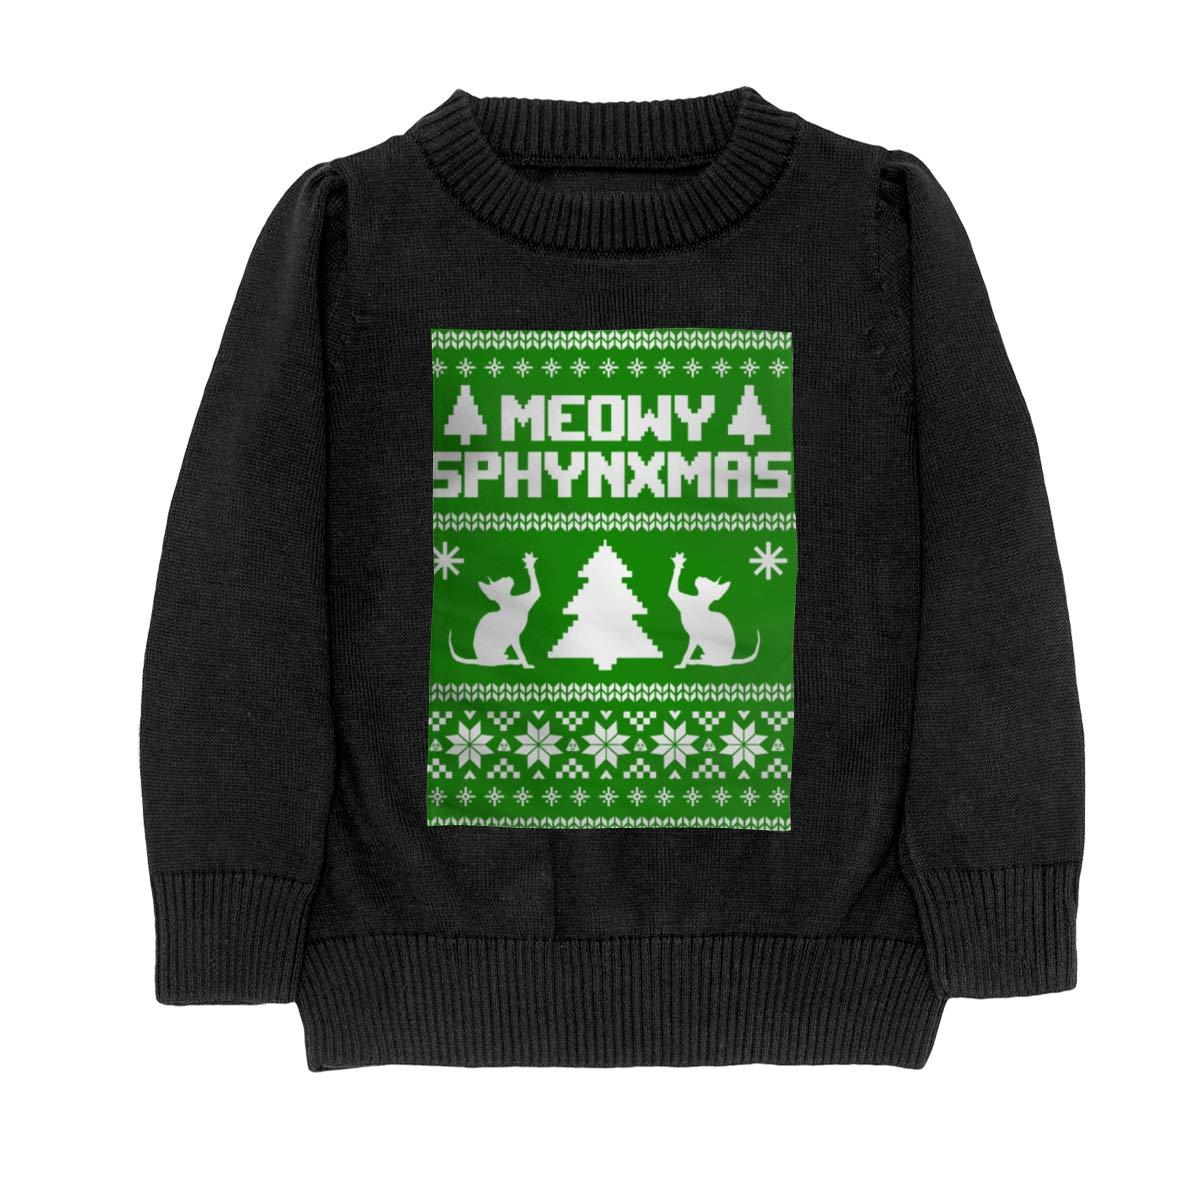 Moniery Meowy Sphynxmas Knit Sweater Pullover for Teenager Girls